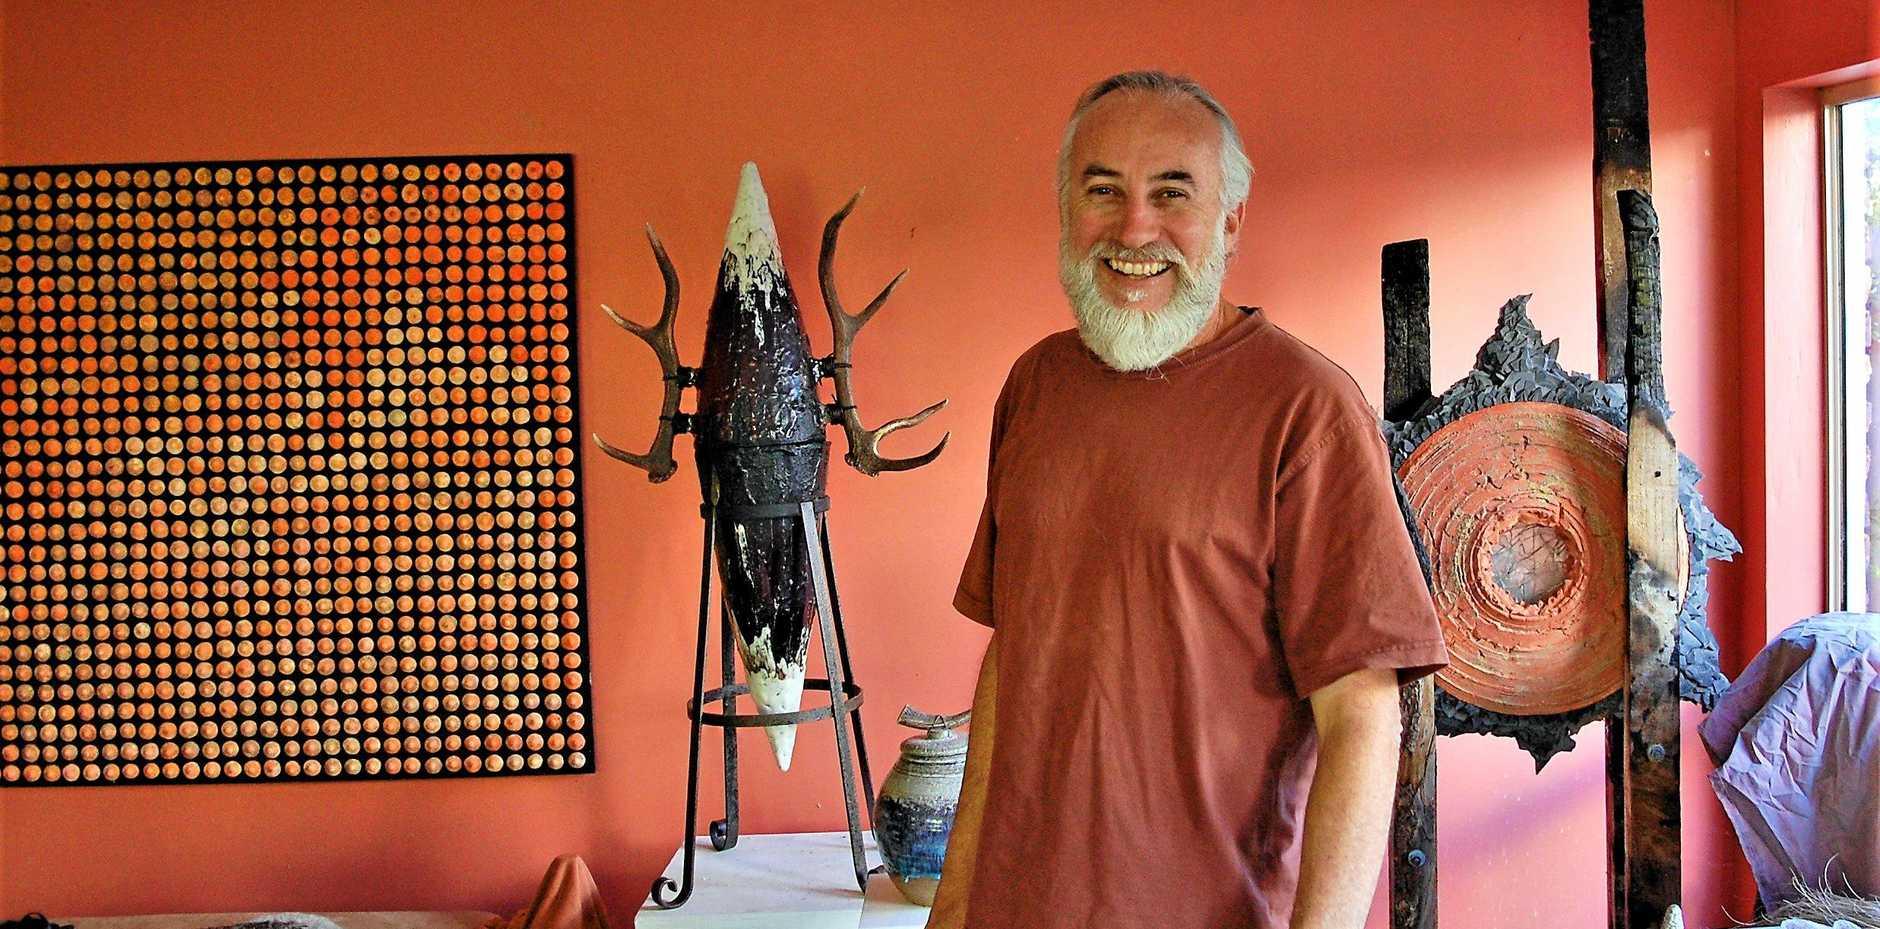 LIFE-LONG ADVENTURE IN ART: Sculptor Michael Wootton in his studio.